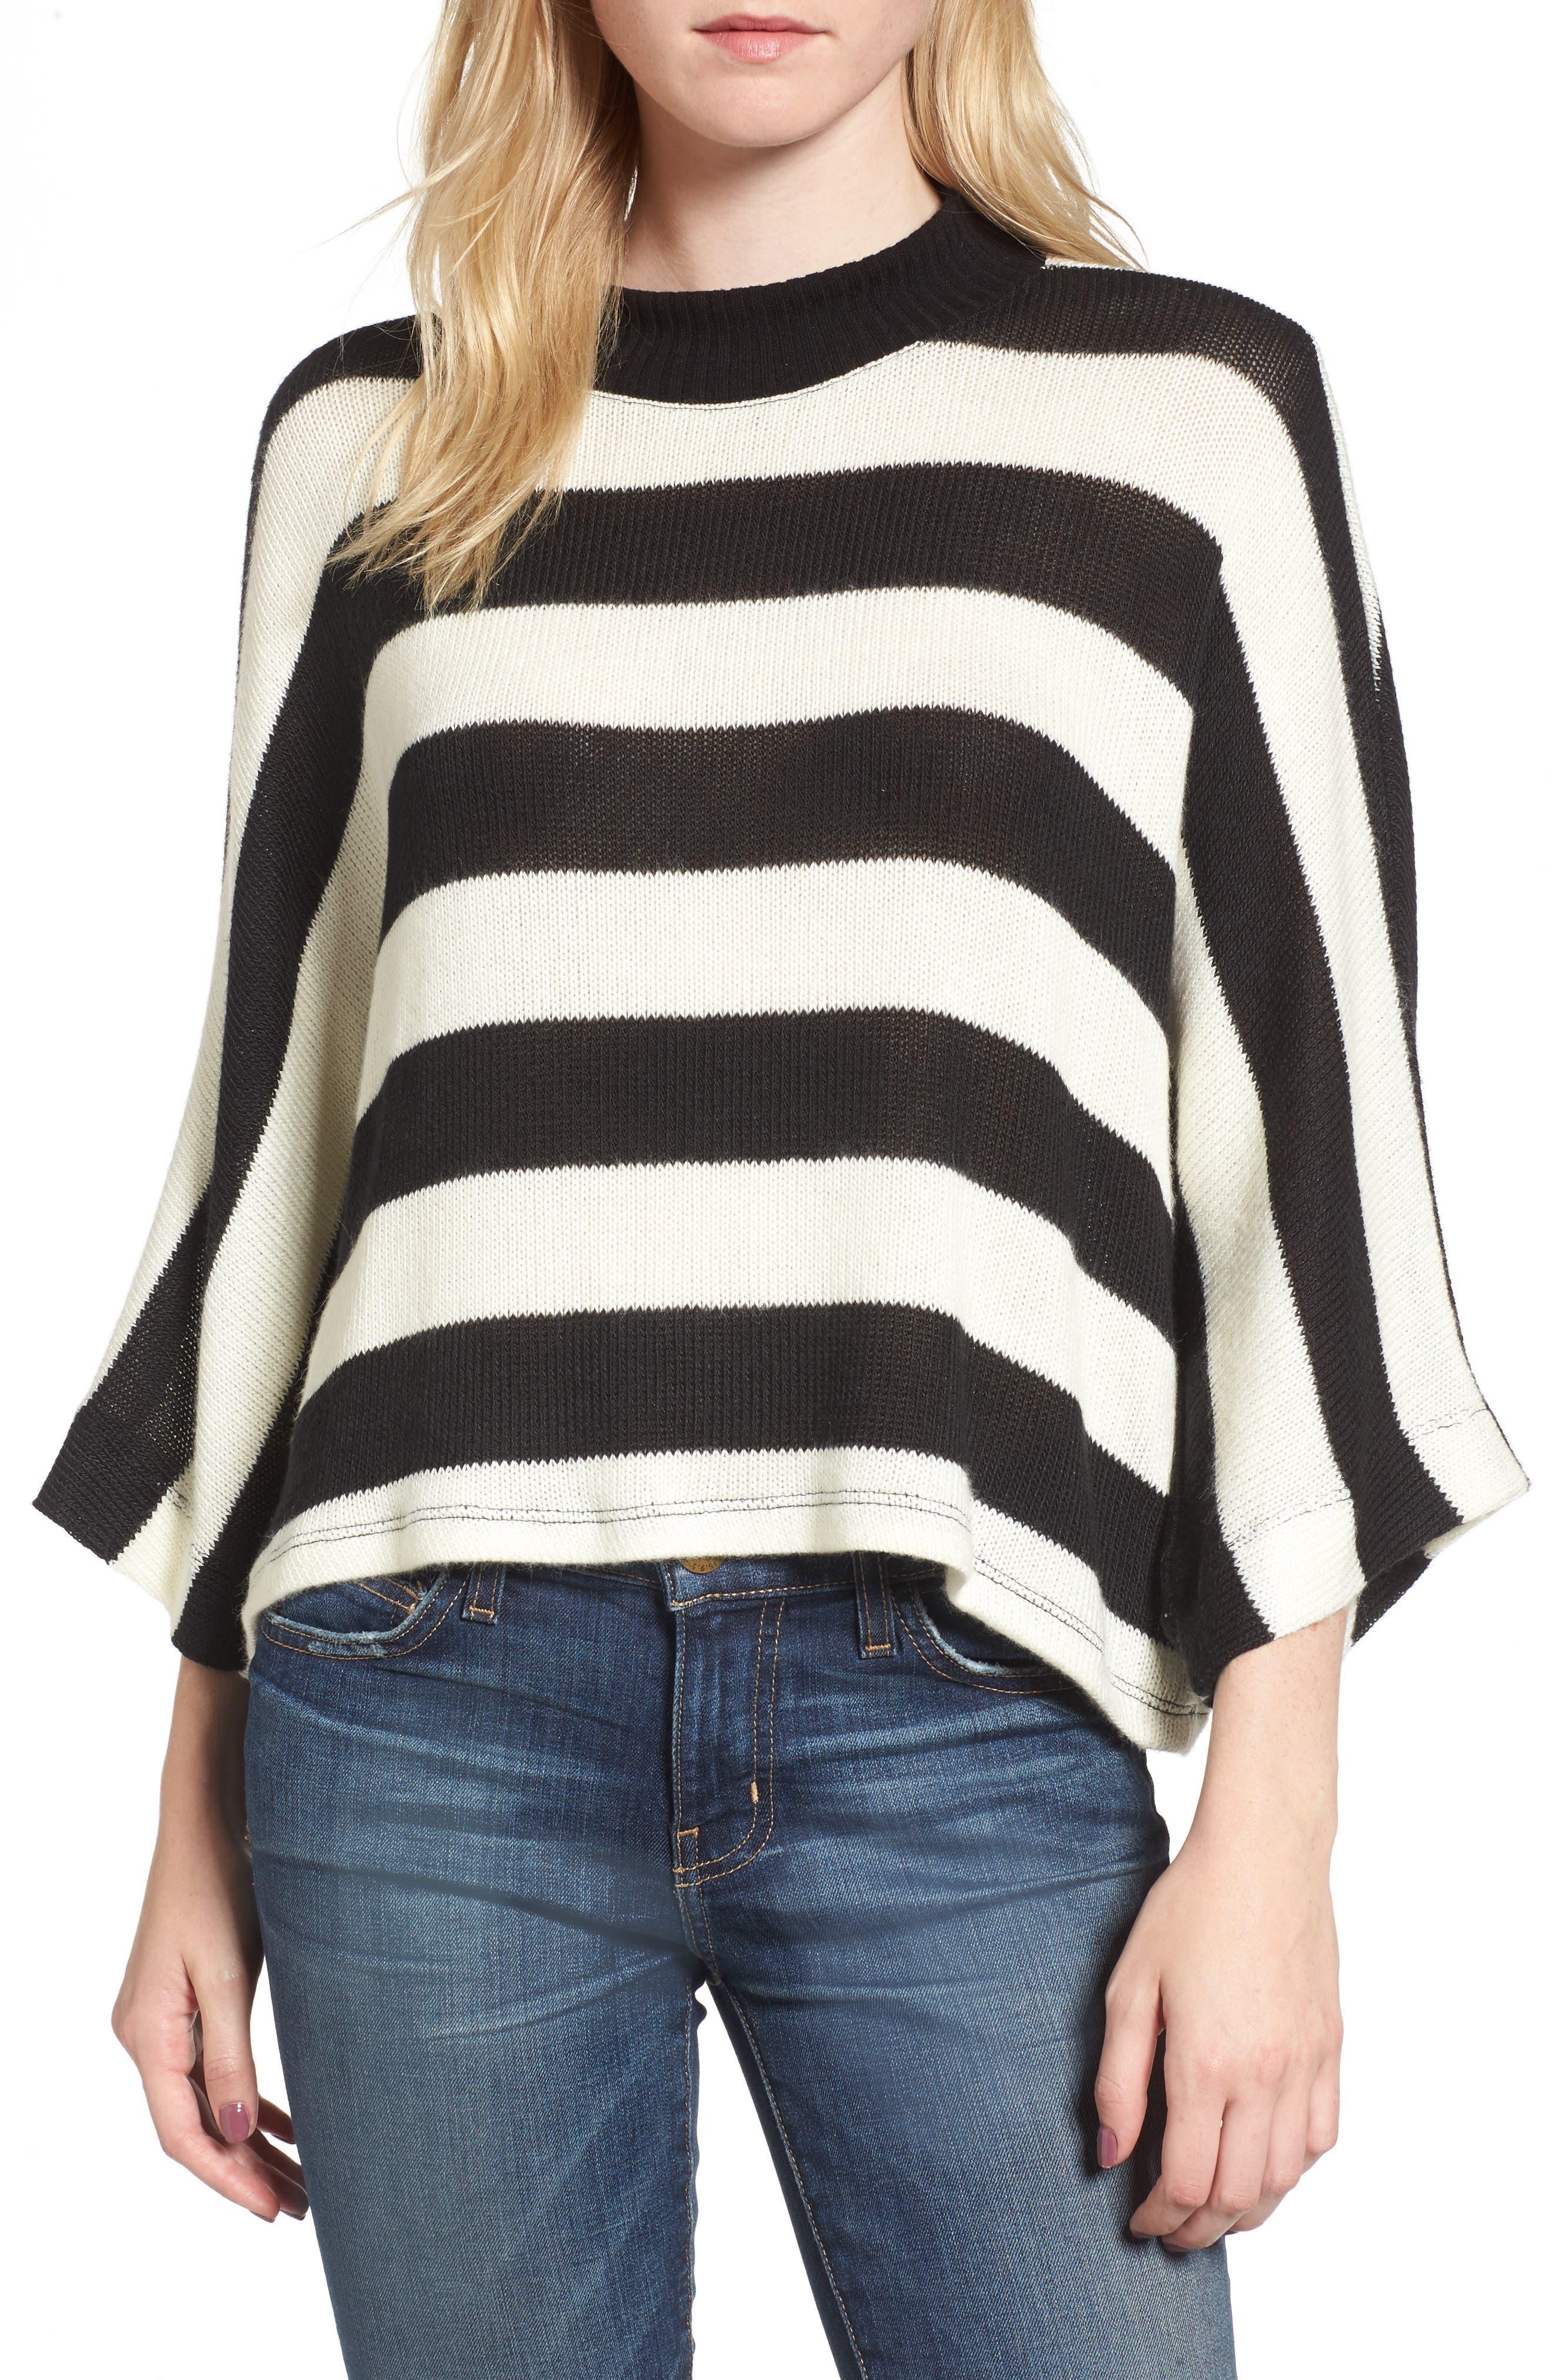 Kingston Stripe Sweater,                         Main,                         color, Black/ Offwhite